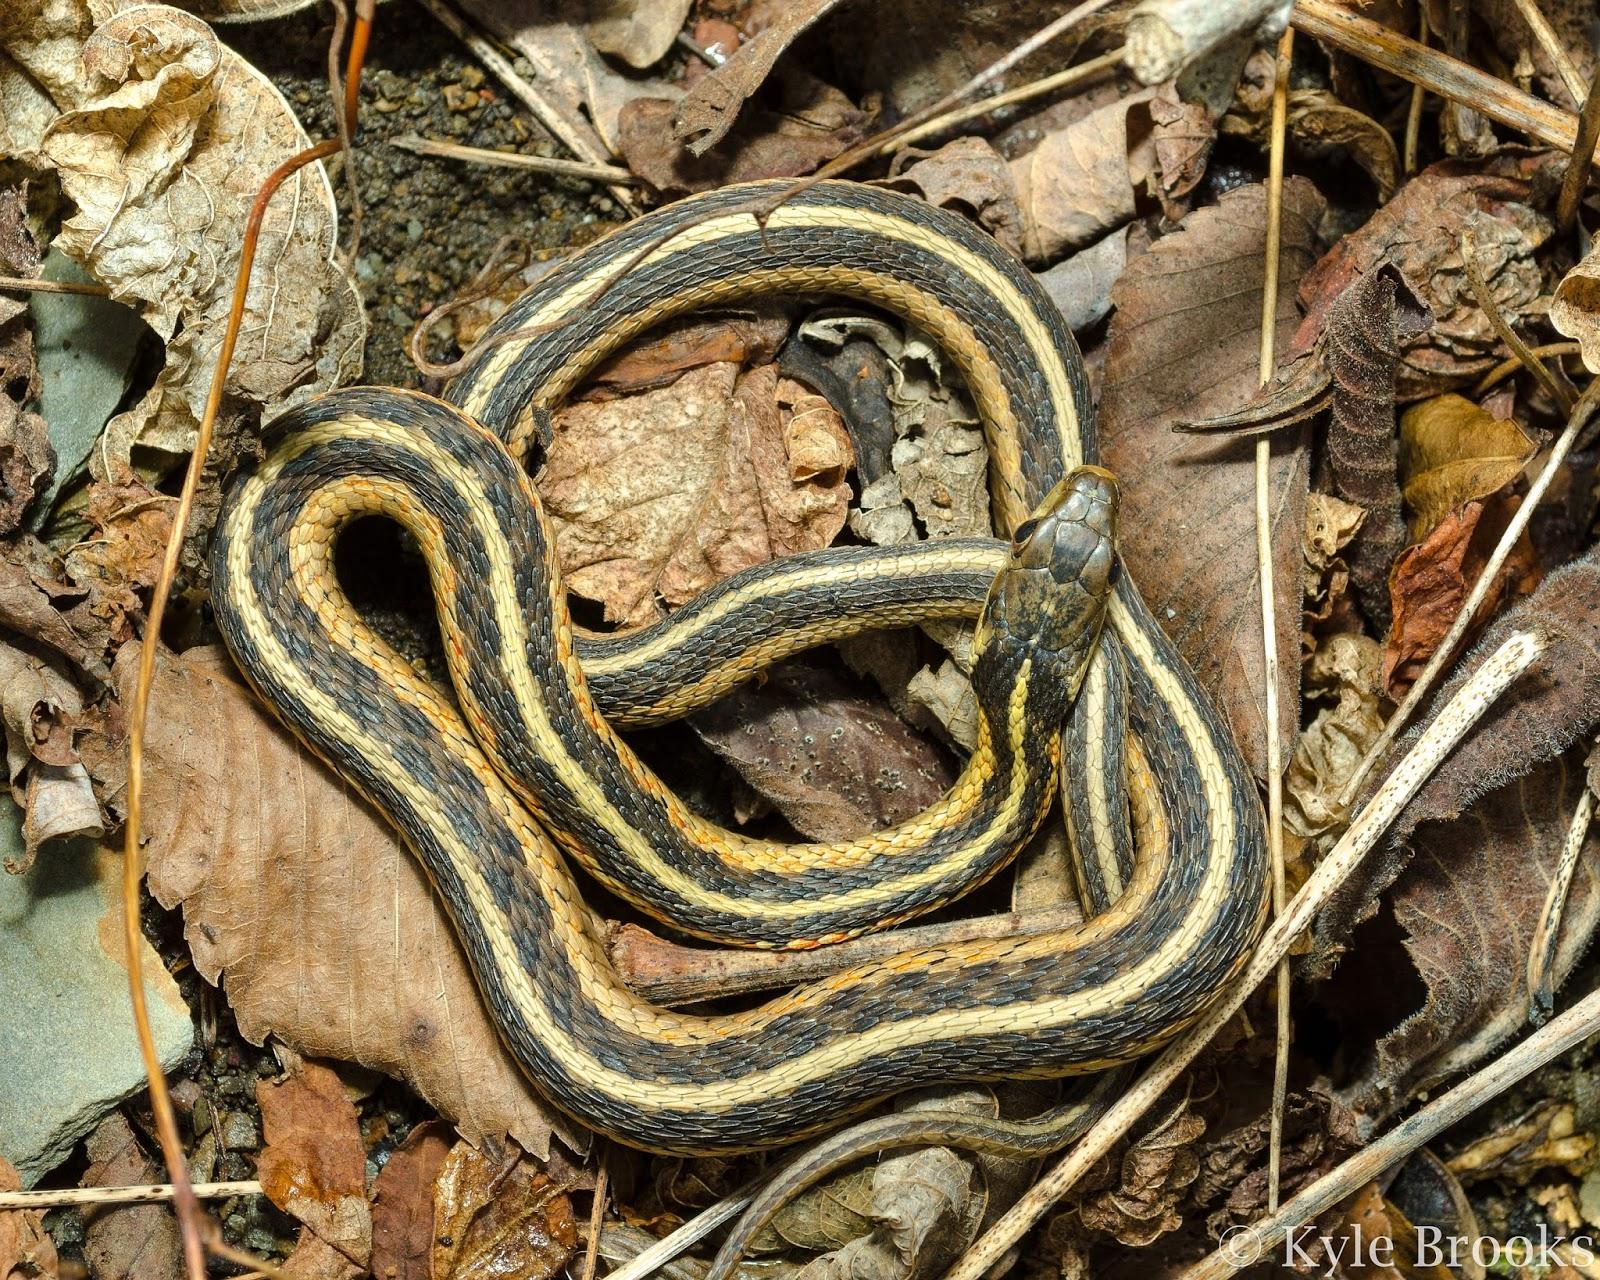 Thamnophis sirtalis Ohio